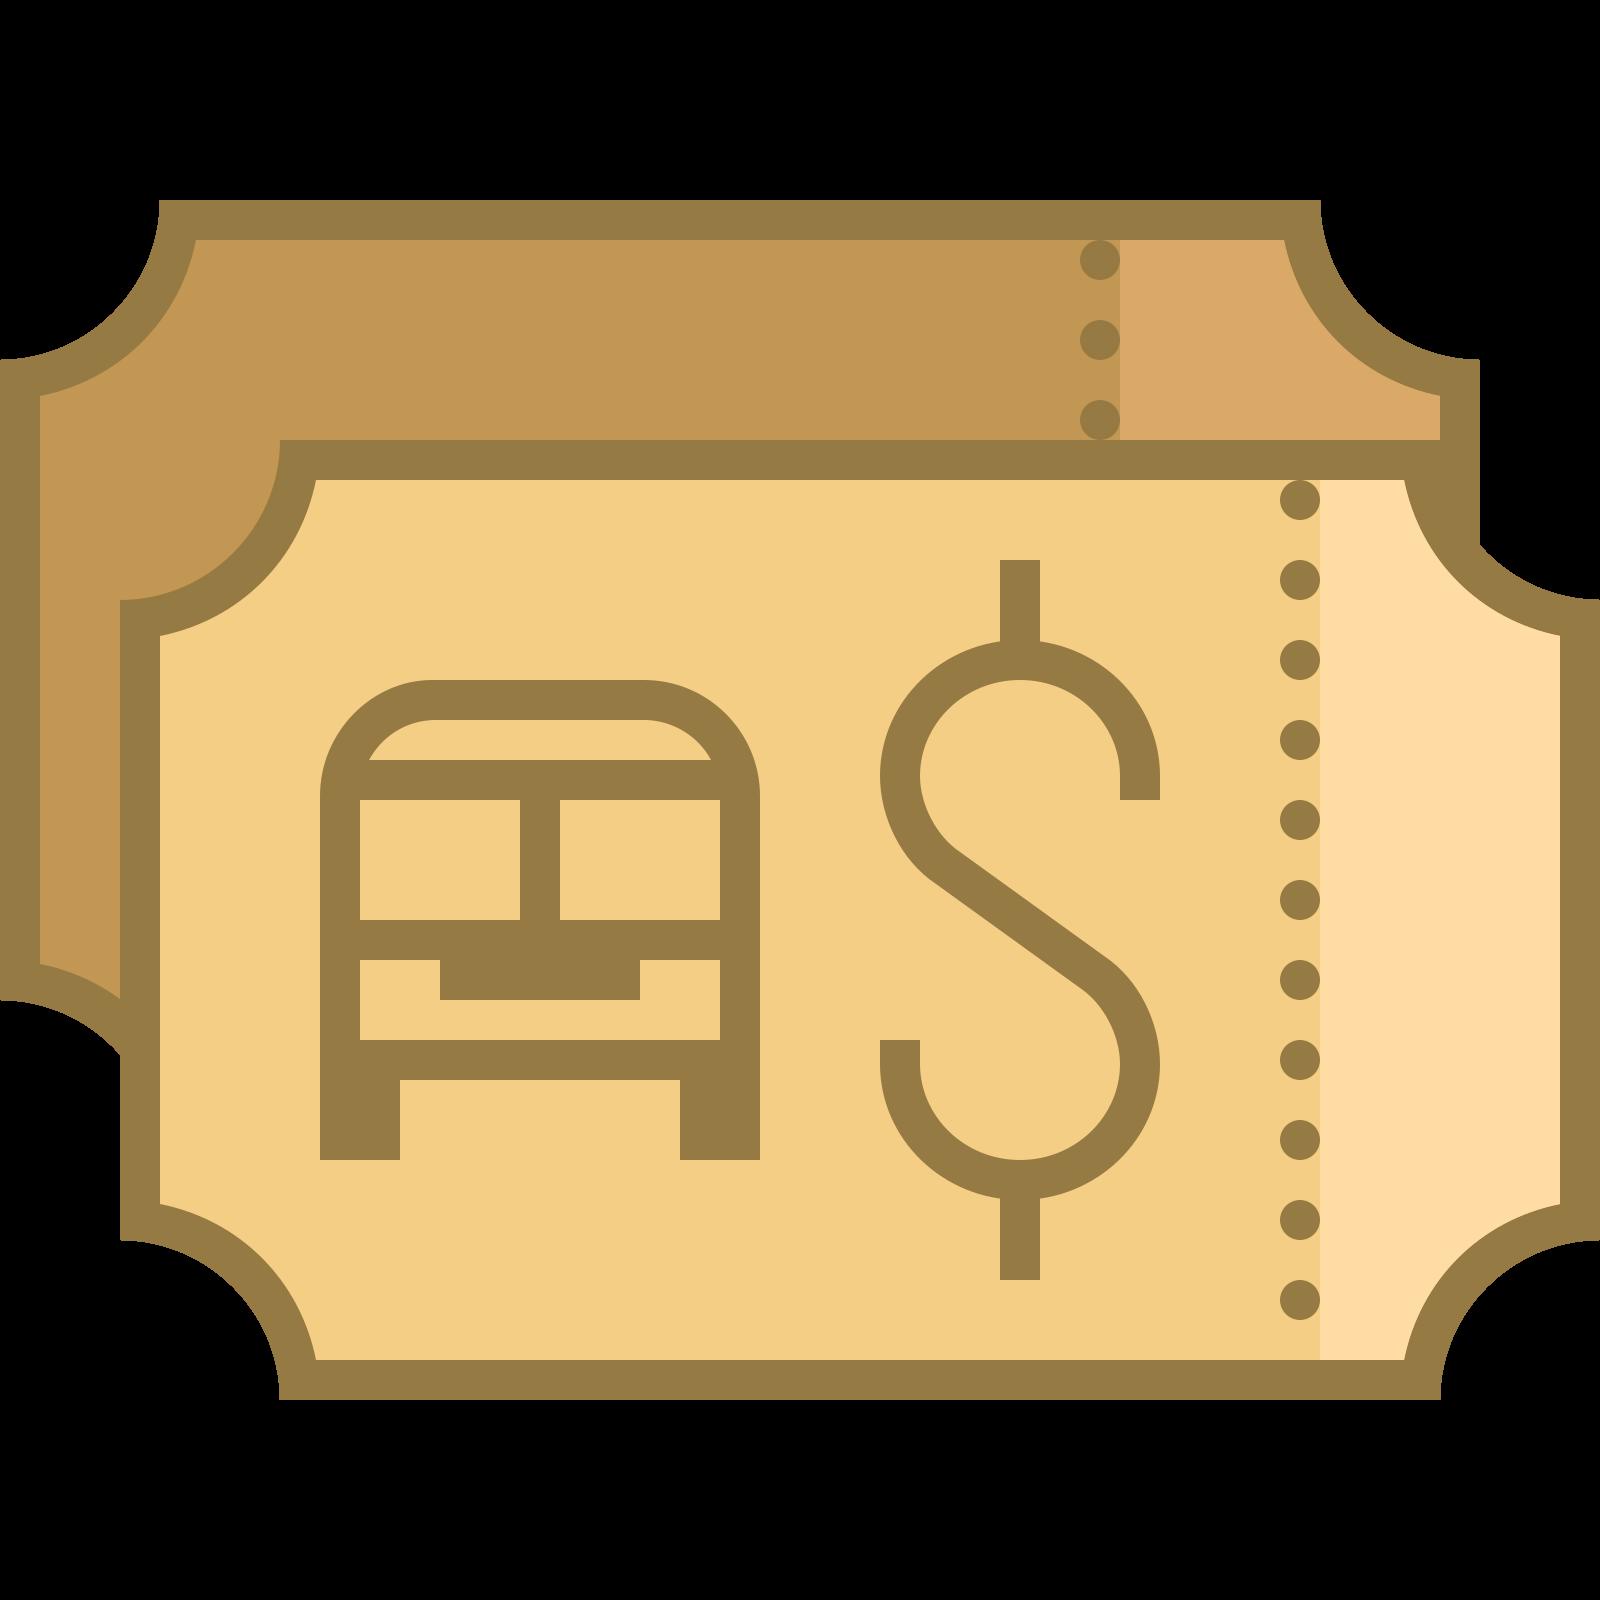 Автобусные билеты icon